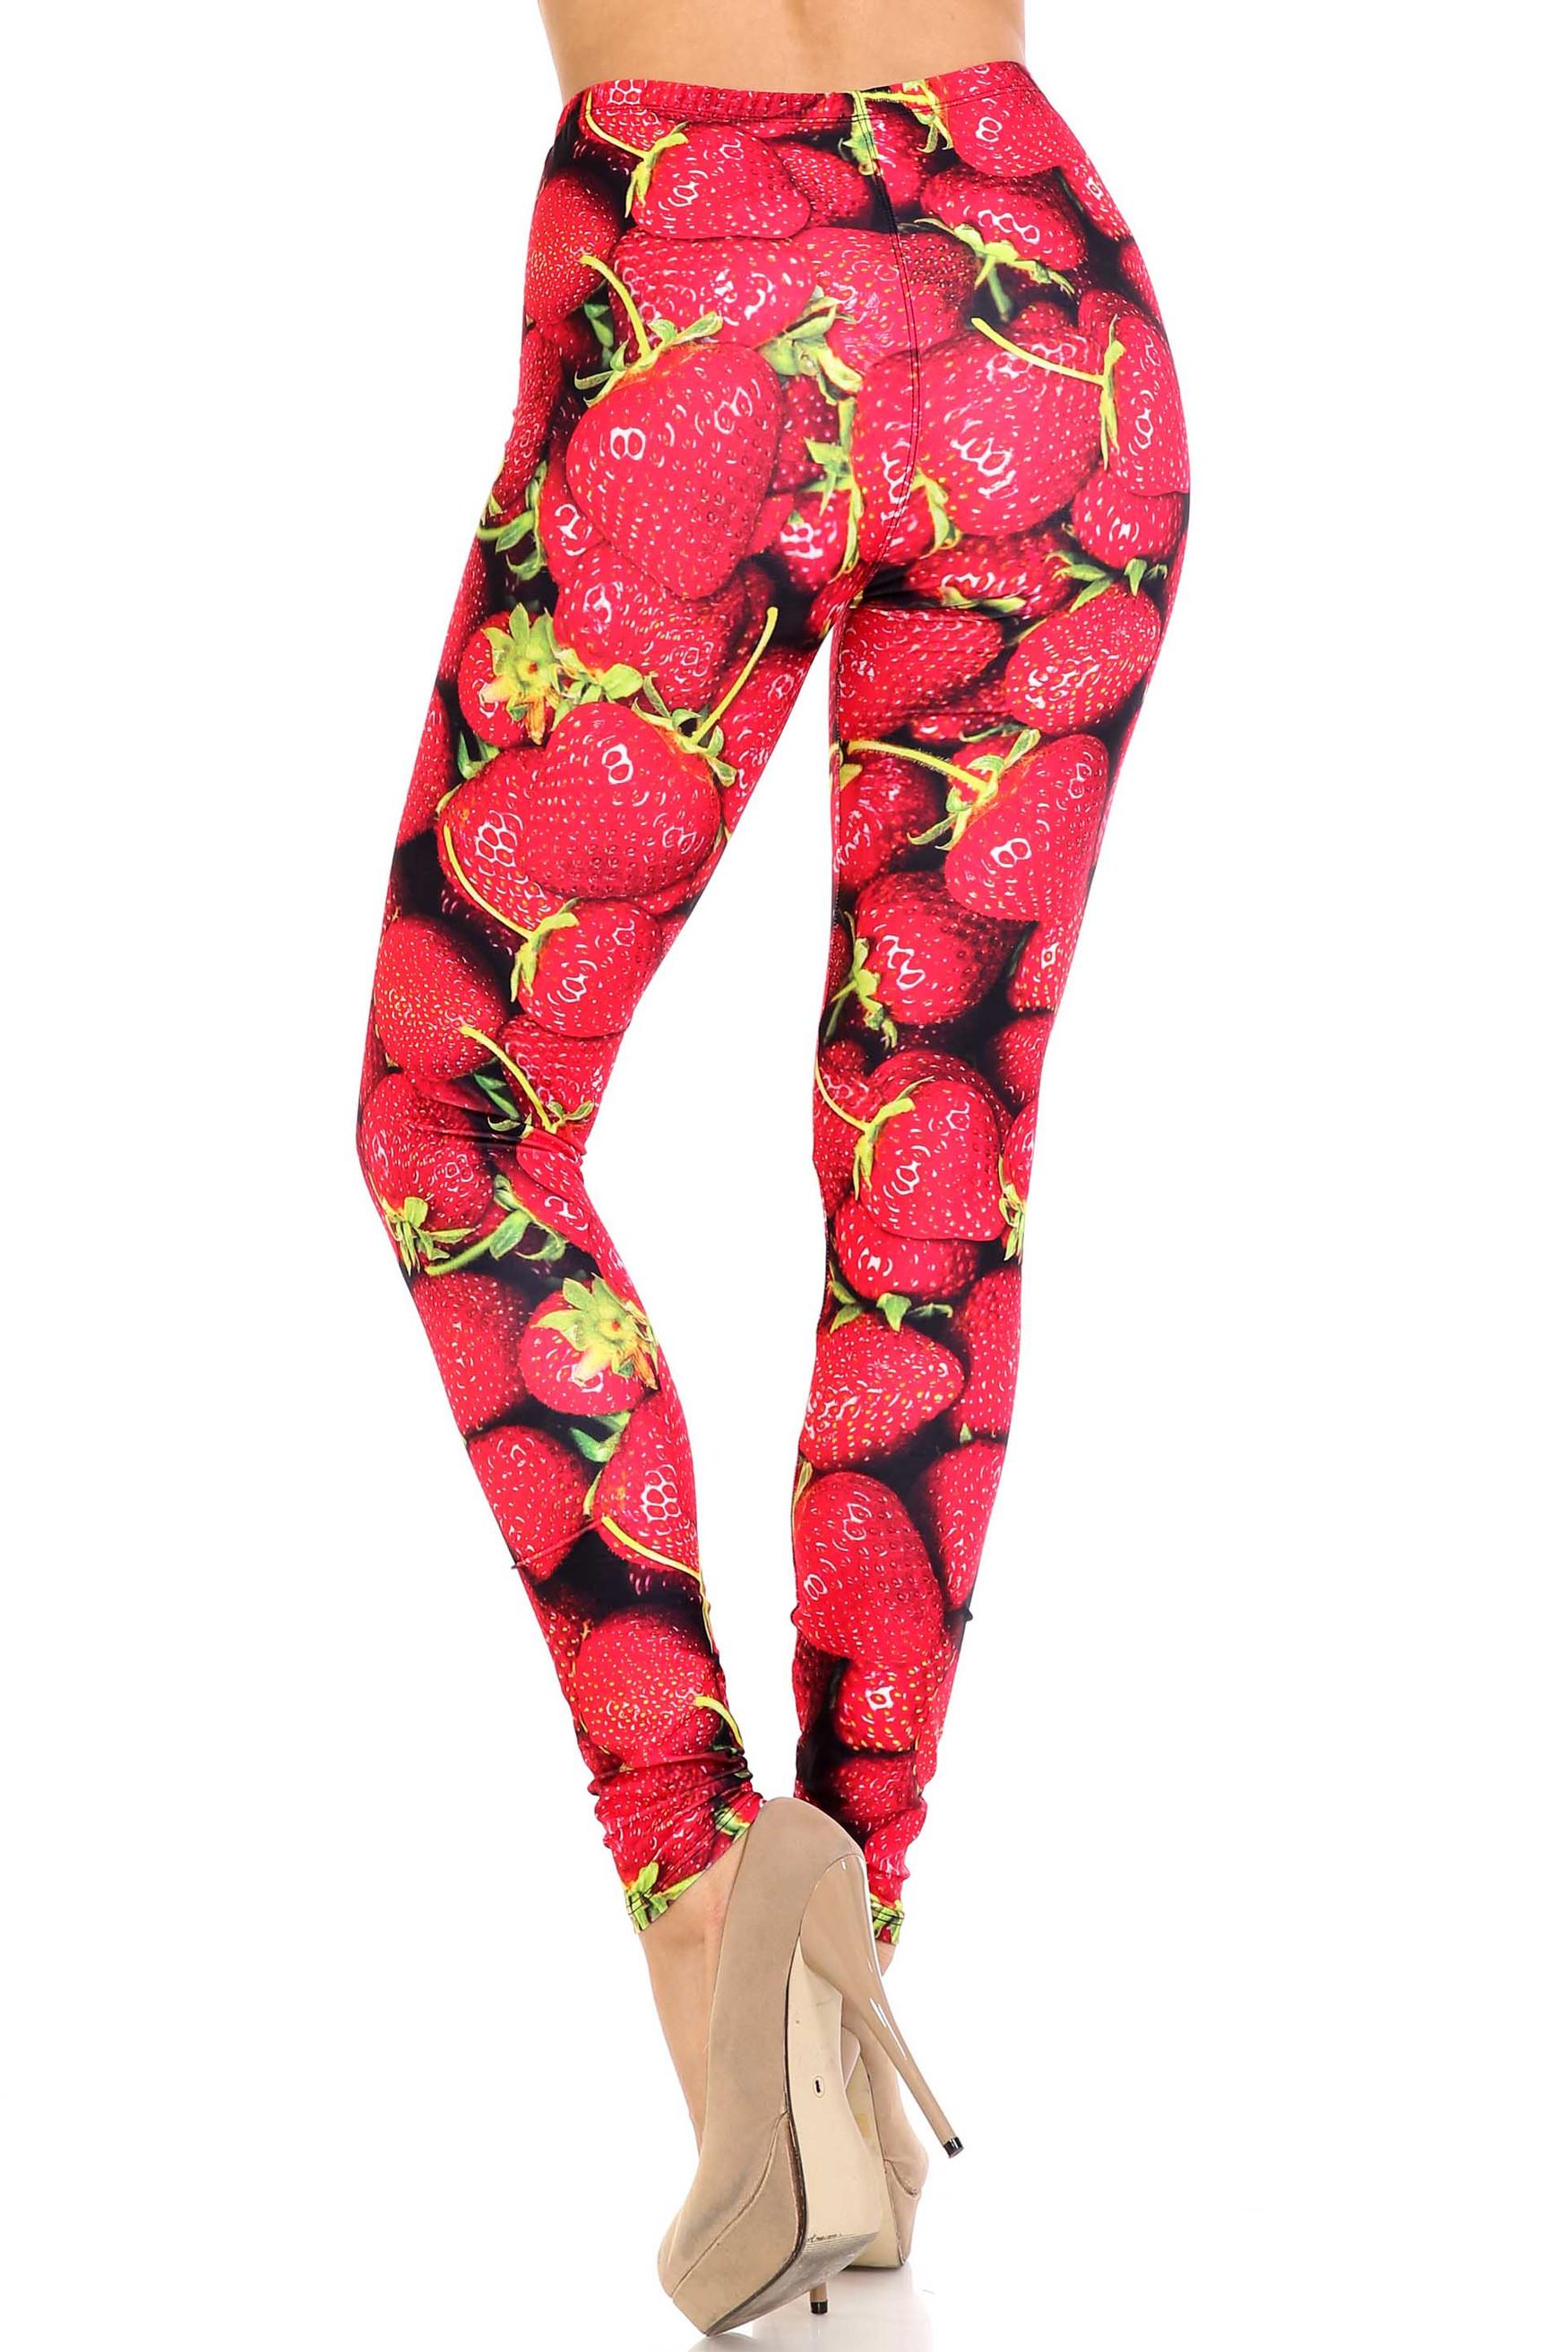 Creamy Soft Strawberry Extra Plus Size Leggings - 3X-5X - USA Fashion™